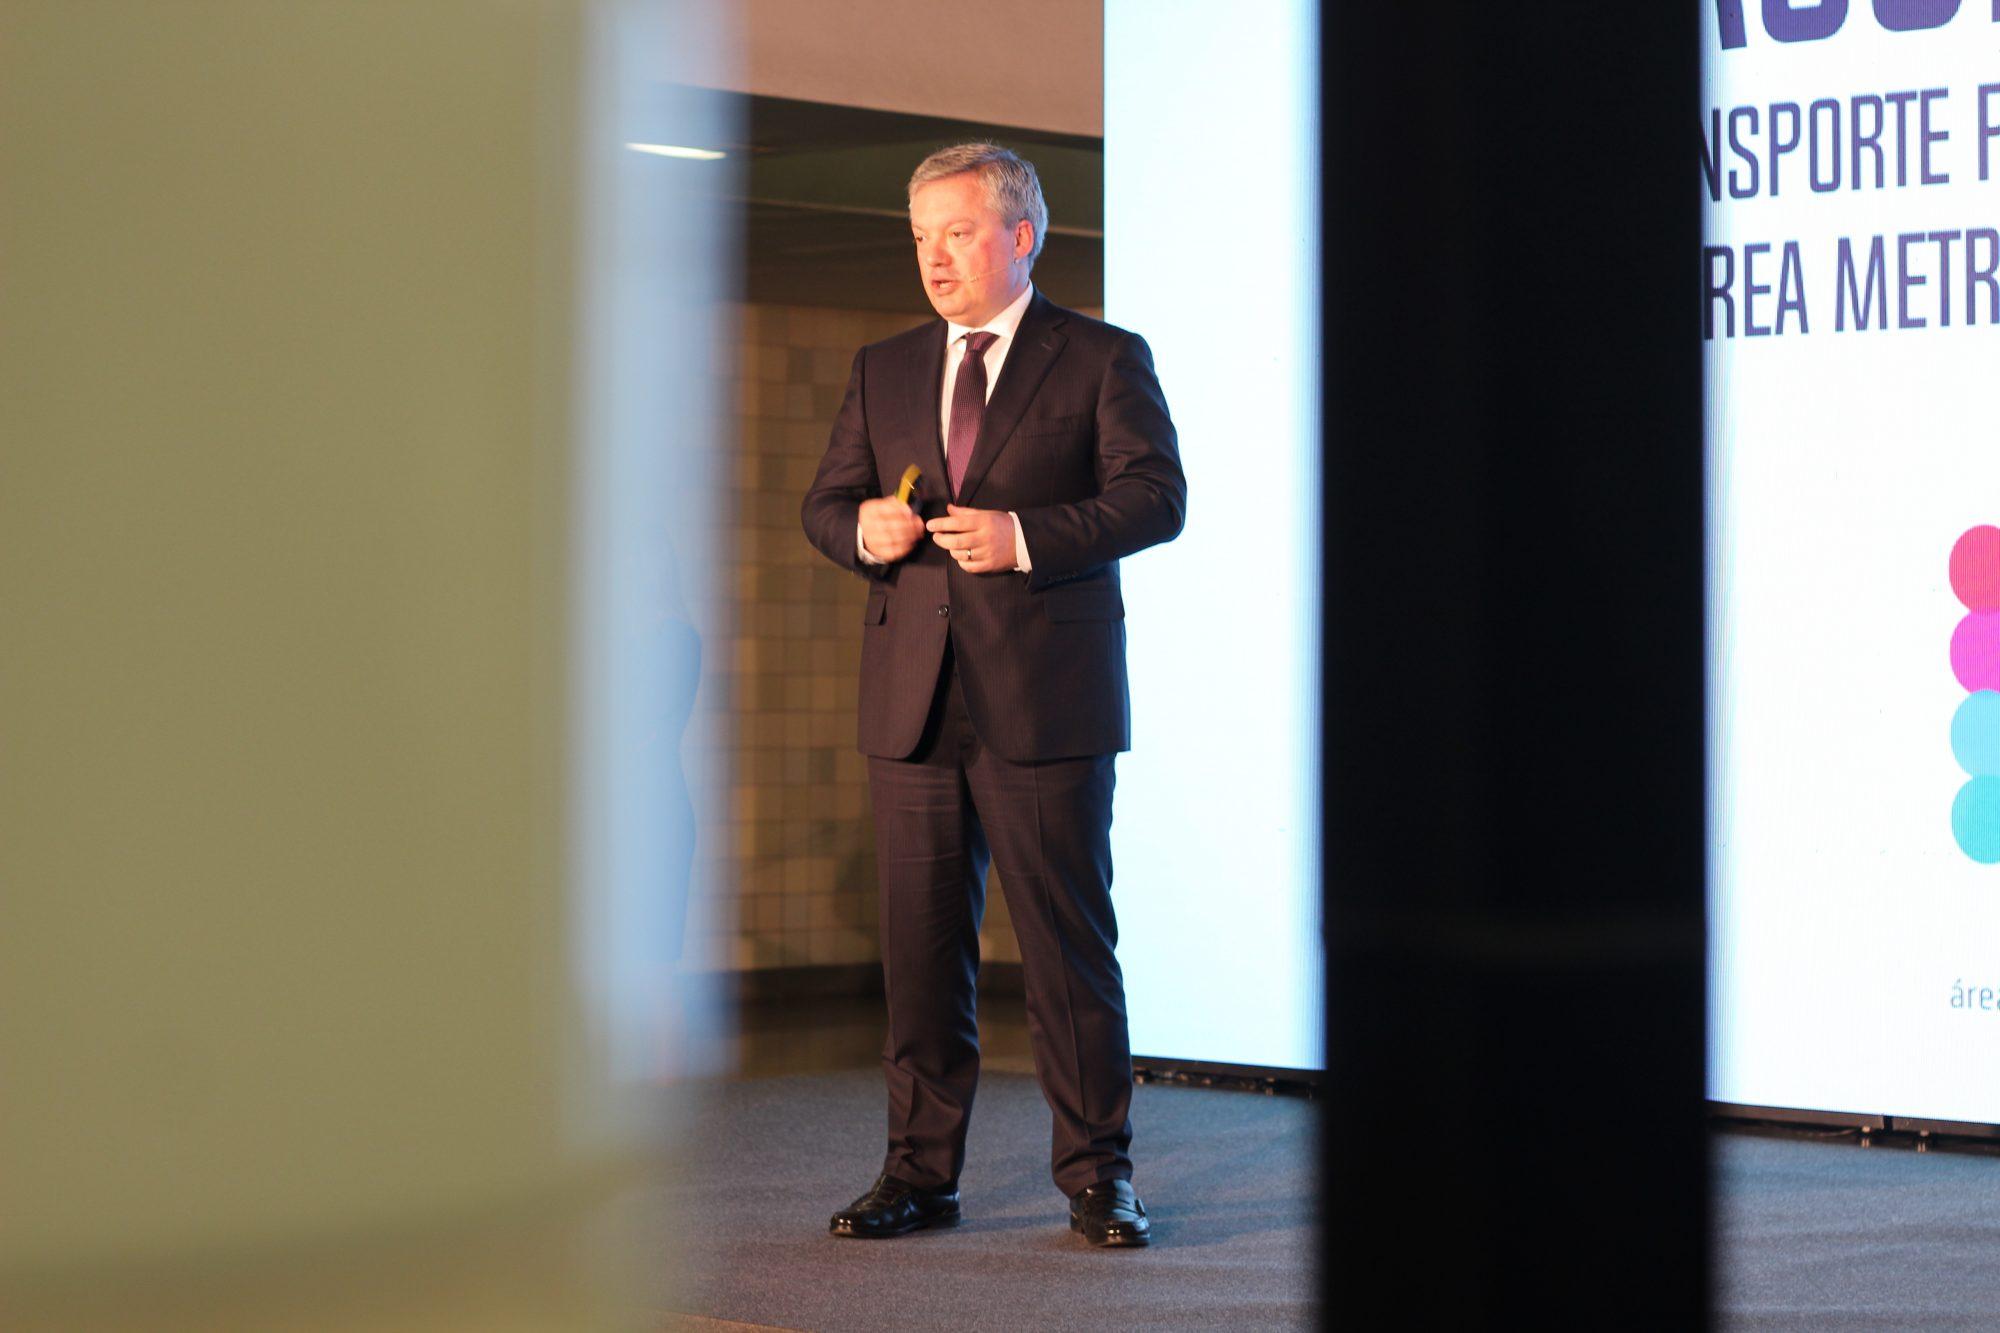 Eduardo Vítor Rodrigues, presidente da AMP, fala na cerimónia sobre o programa.